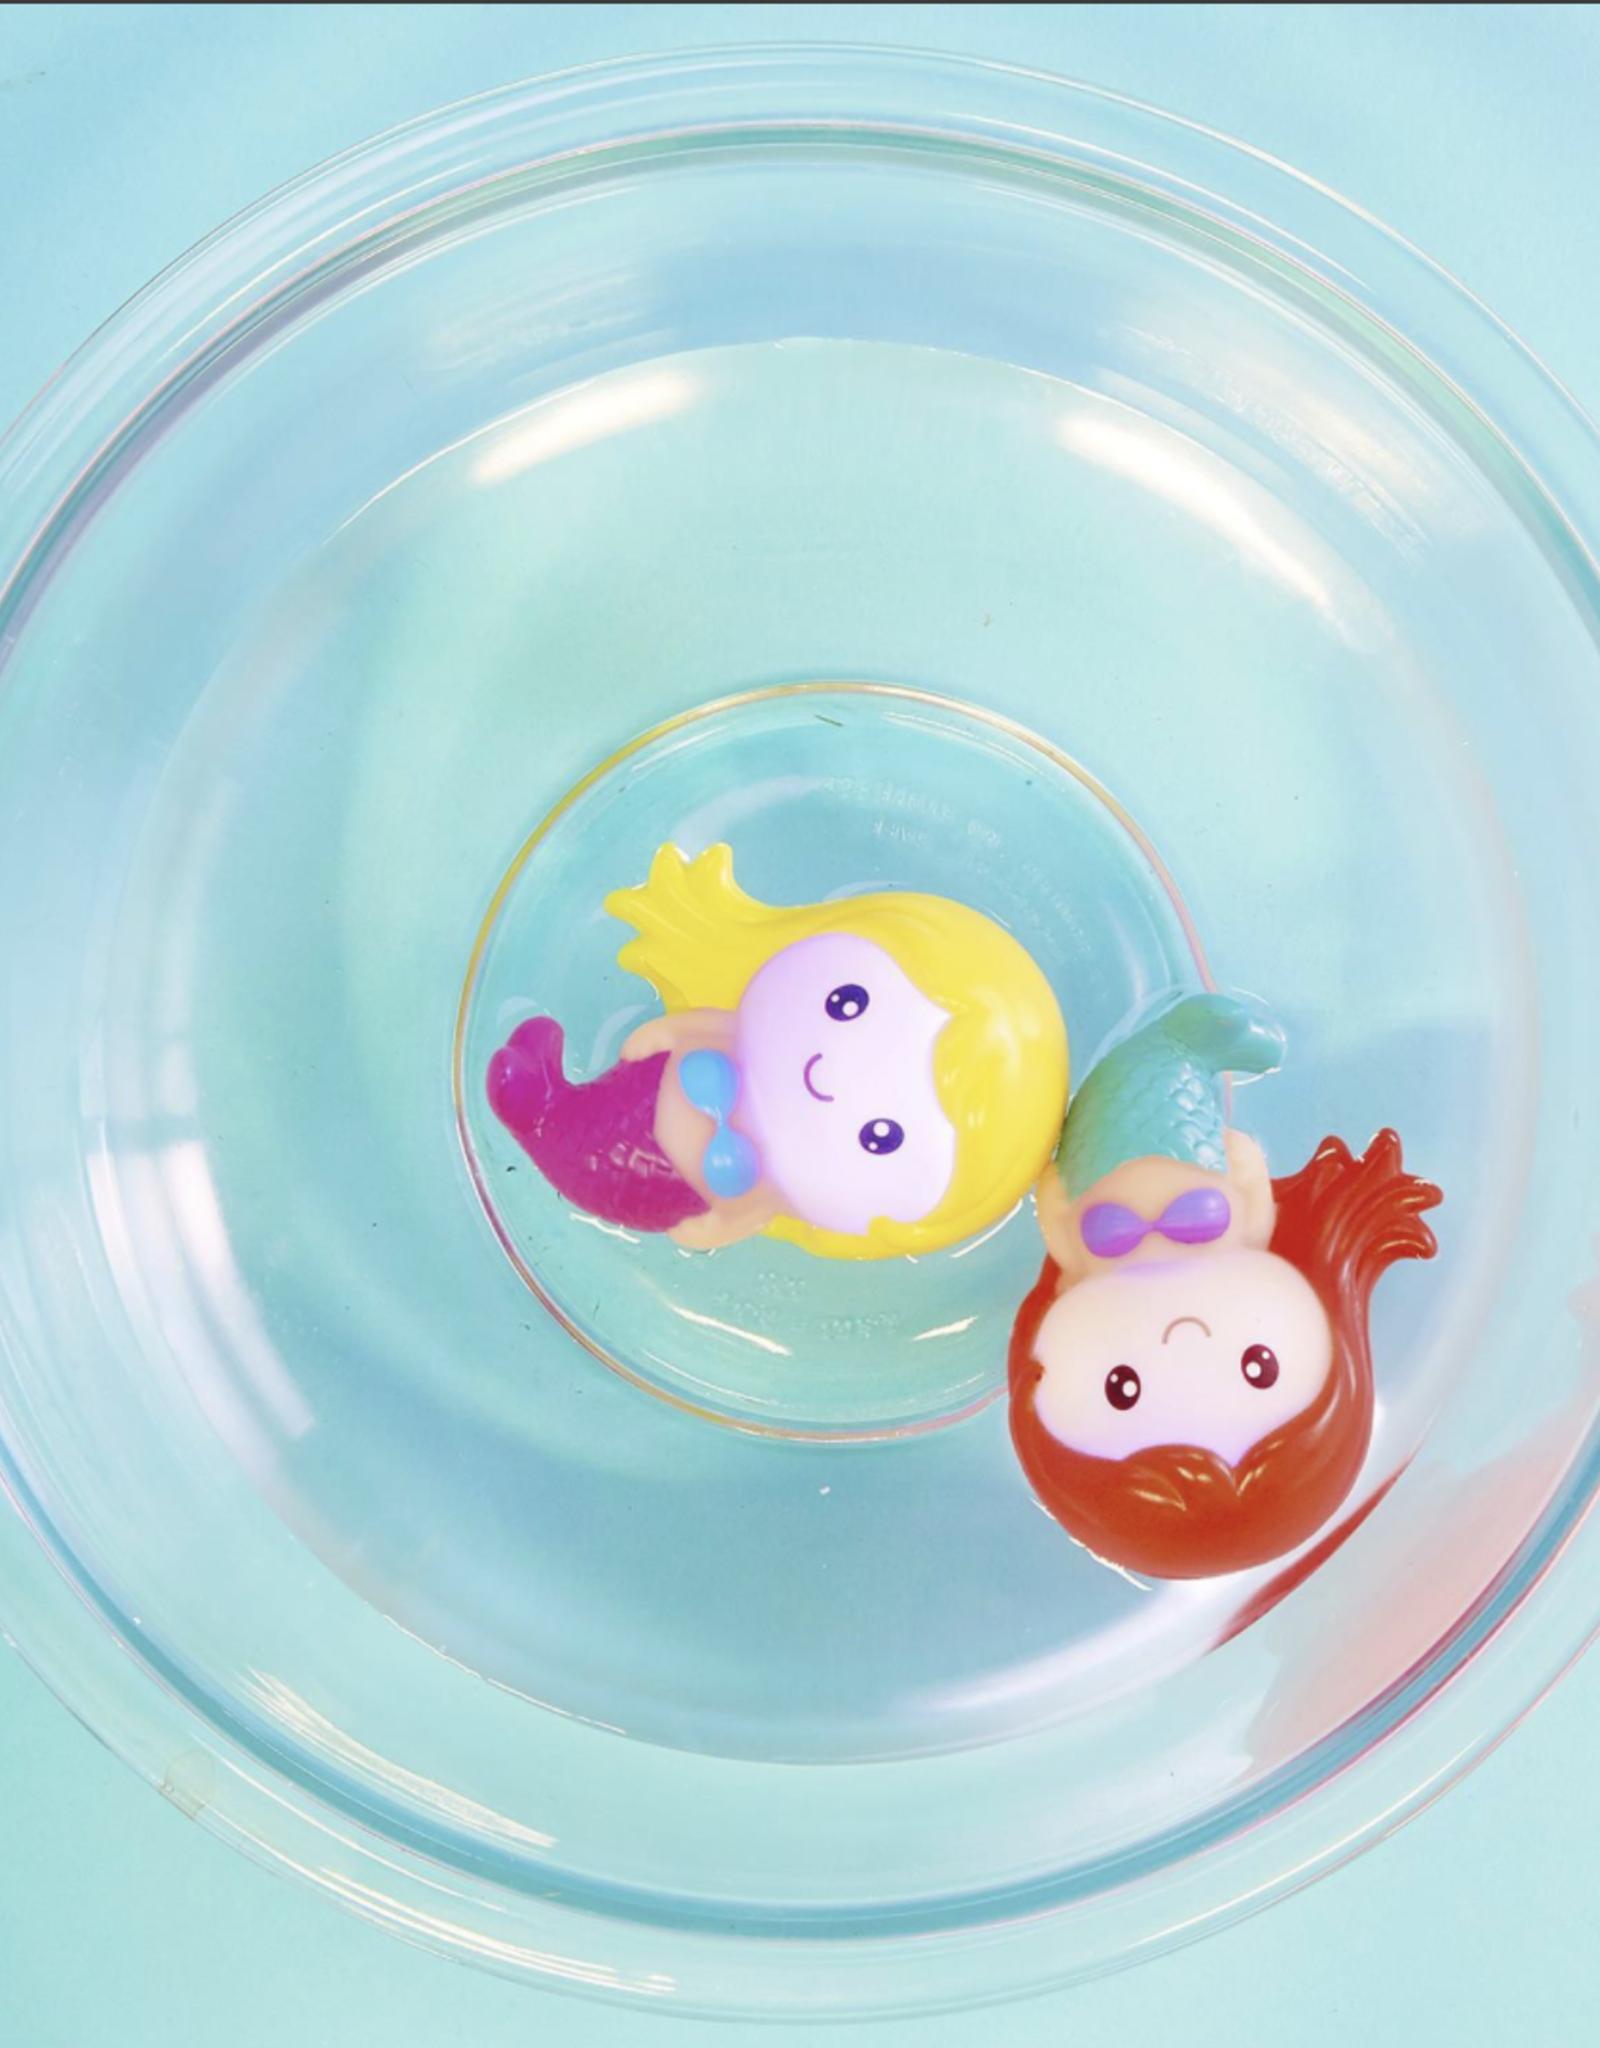 Two's Company Floating Mermaid LED Bath Toy